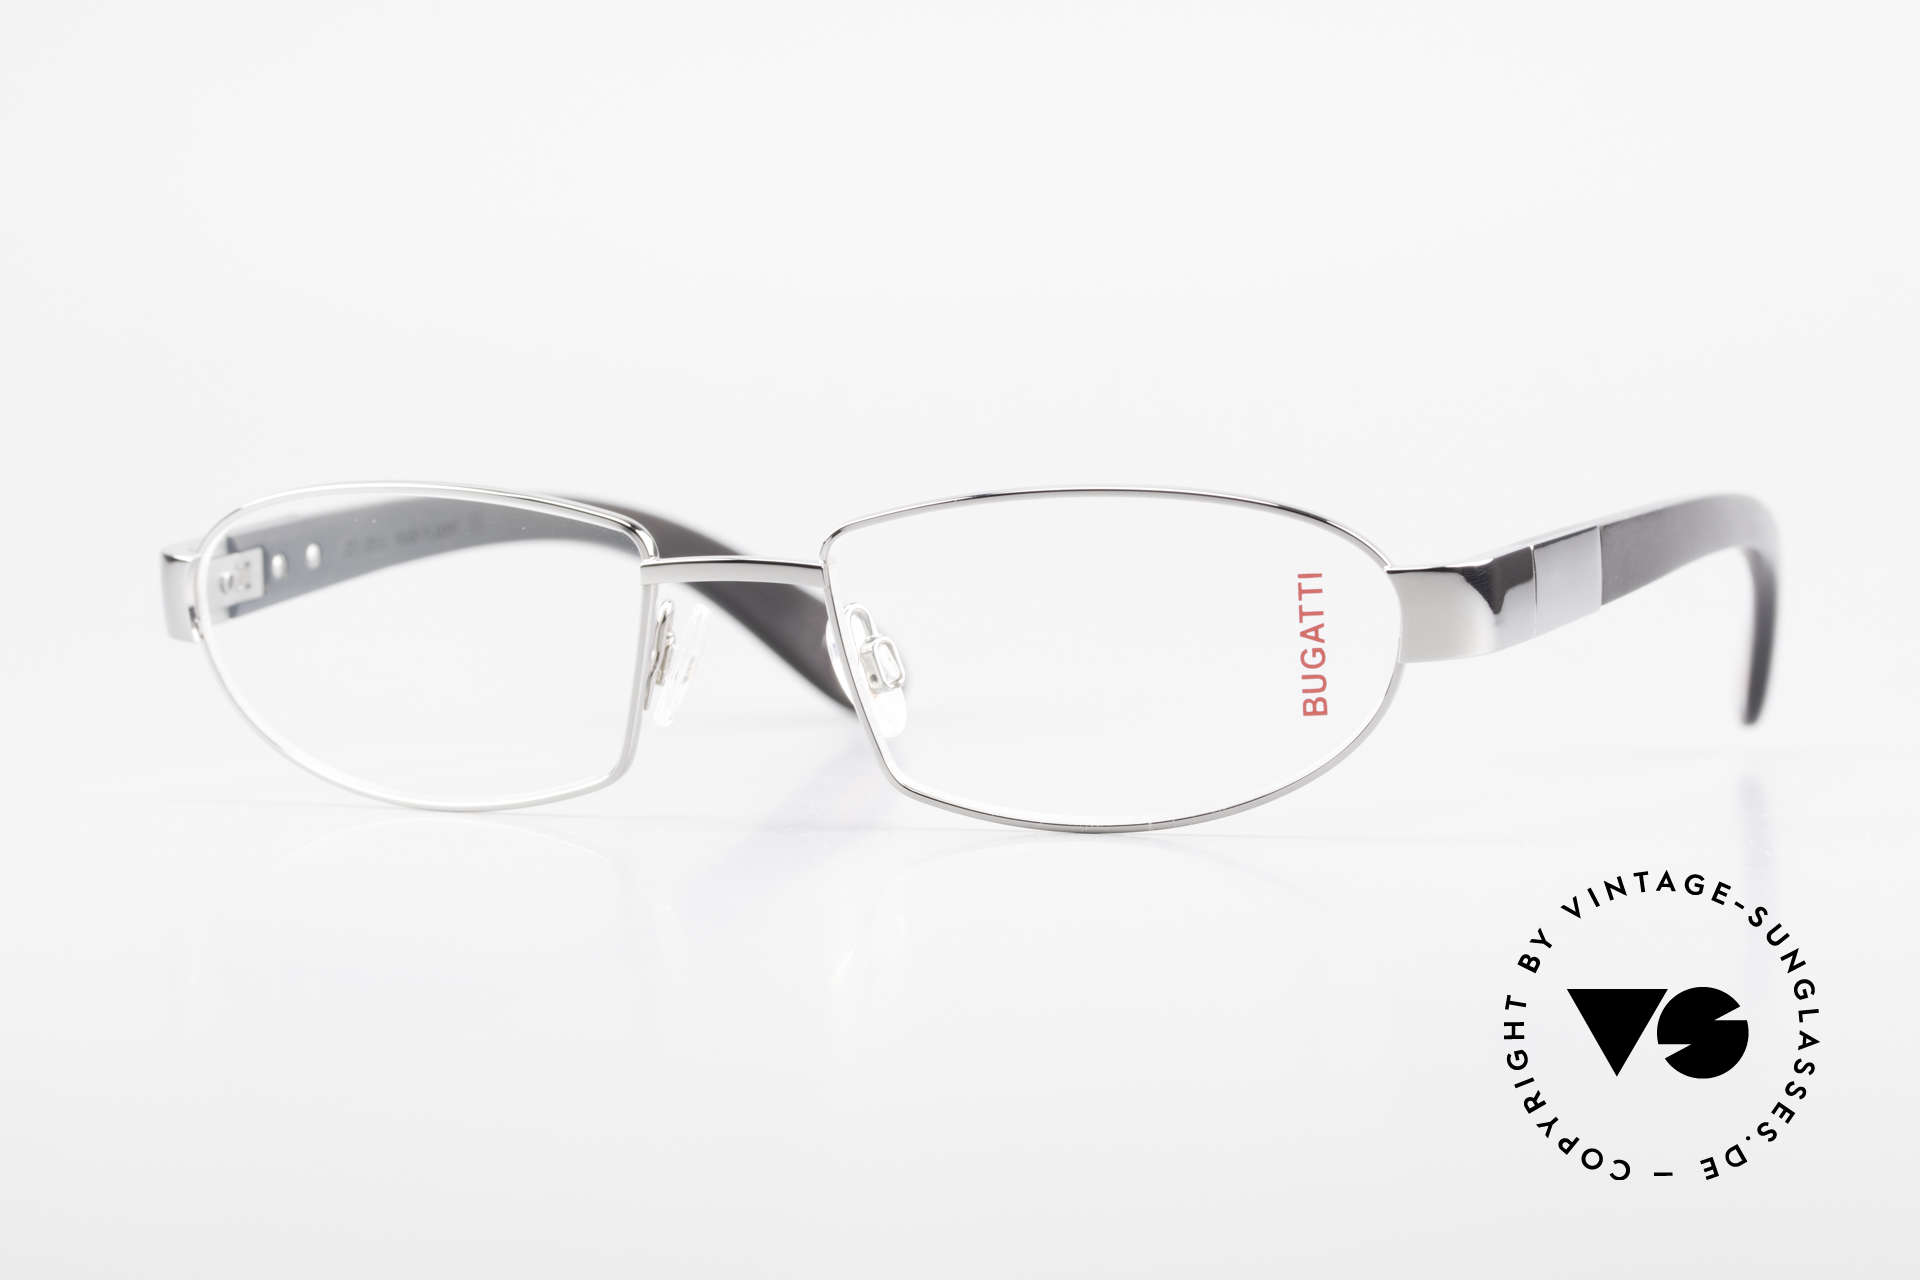 Bugatti 530 Ebony Titan Ruthenium Frame, luxury eyeglasses by BUGATTI, TOP-NOTCH quality, Made for Men